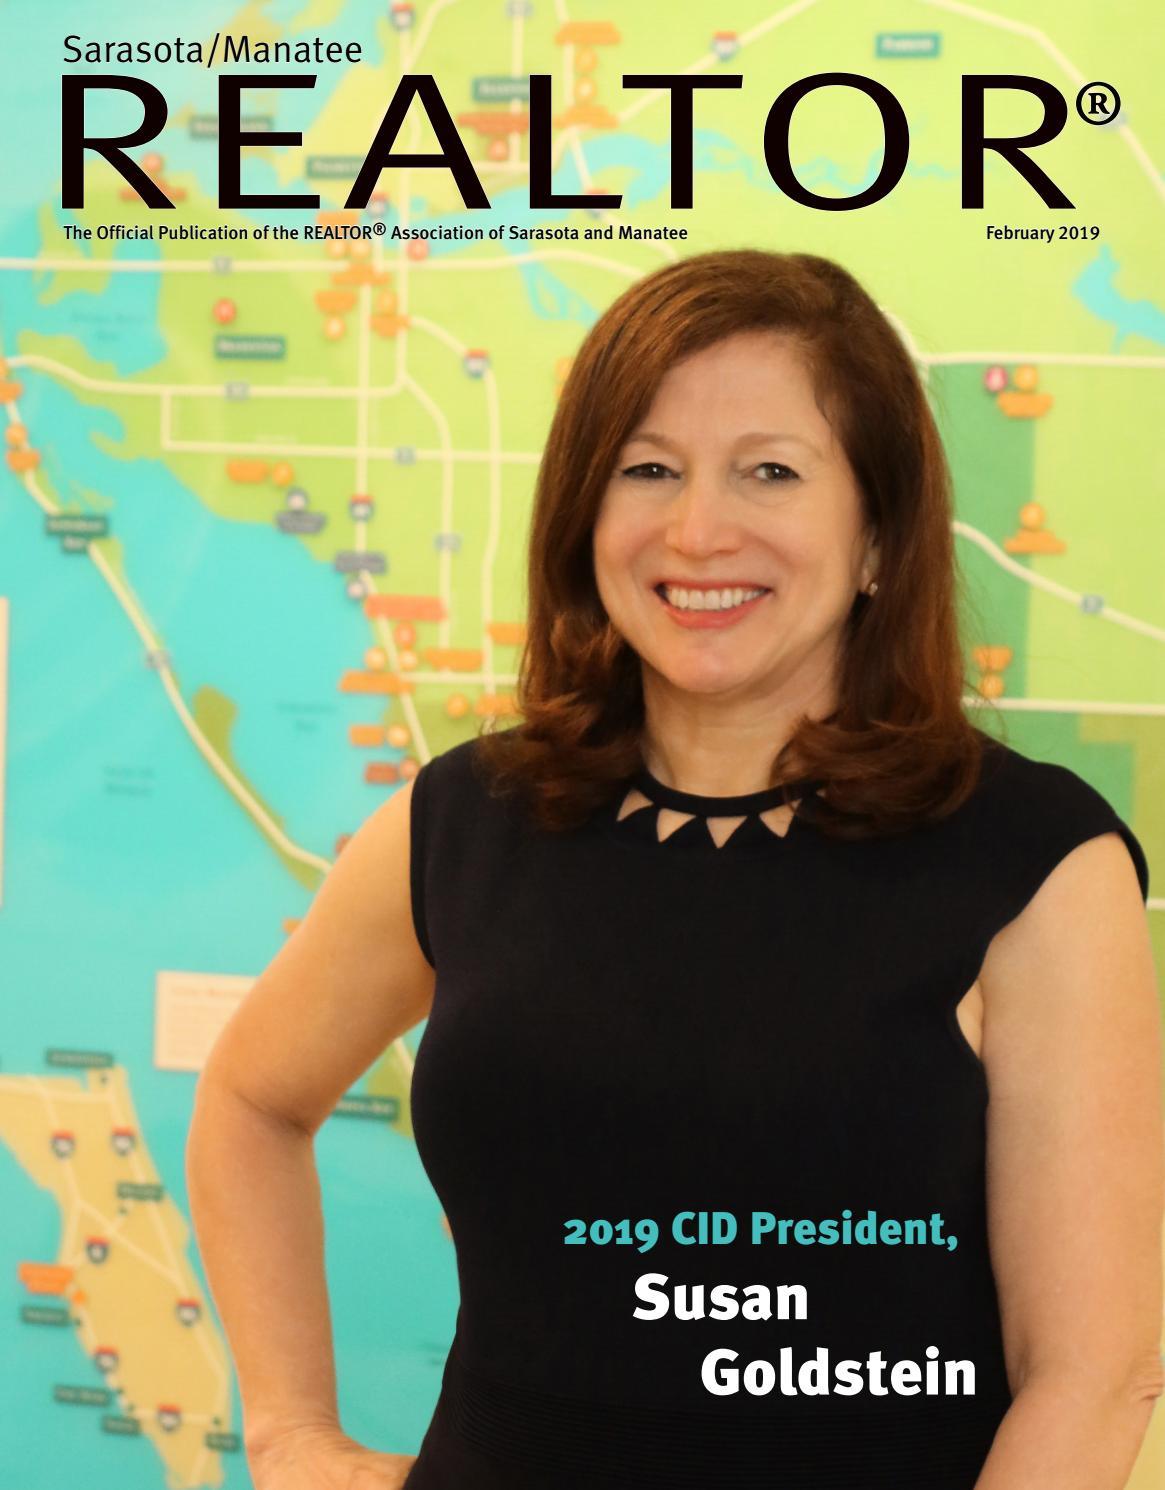 Sarasota Calendar, February 2019 Sarasota Manatee Realtor Magazine   RASM   February 2019 Issue by